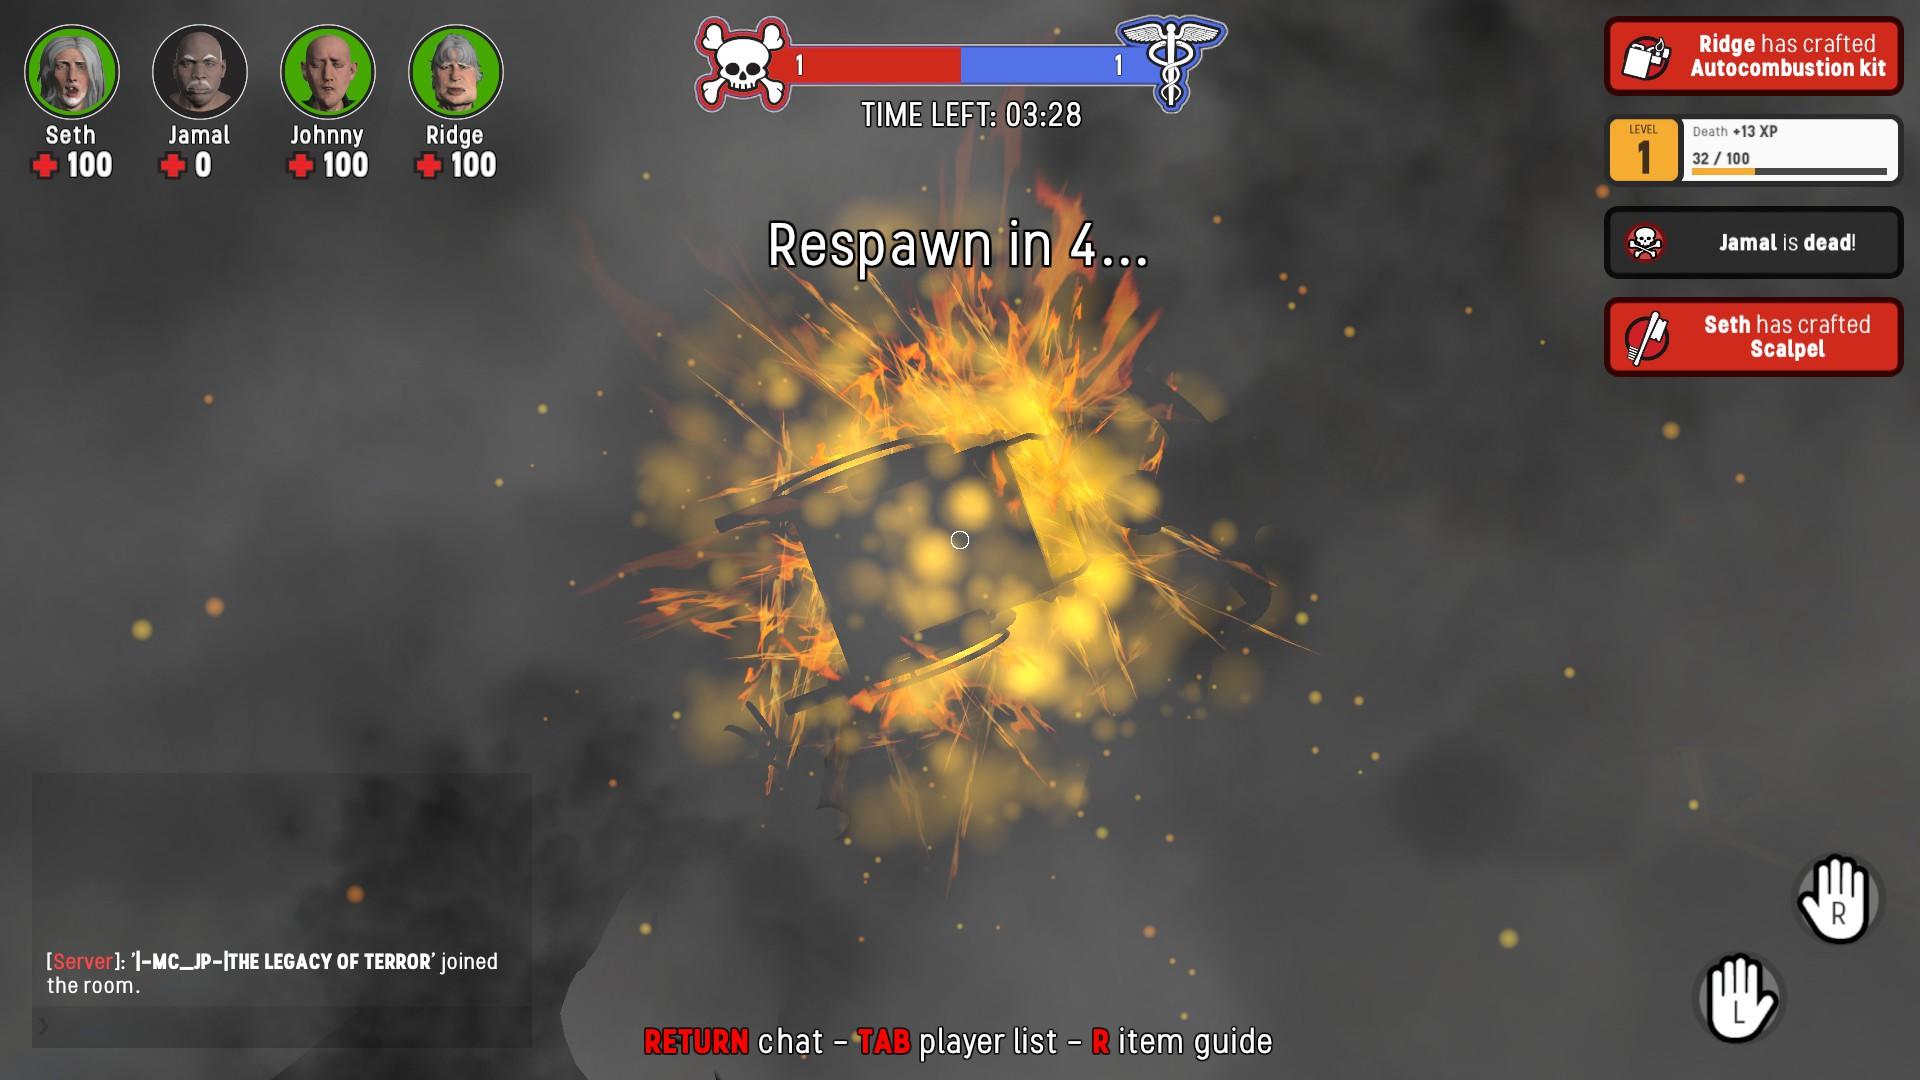 3rd-strike com | Stayin' Alive – Preview